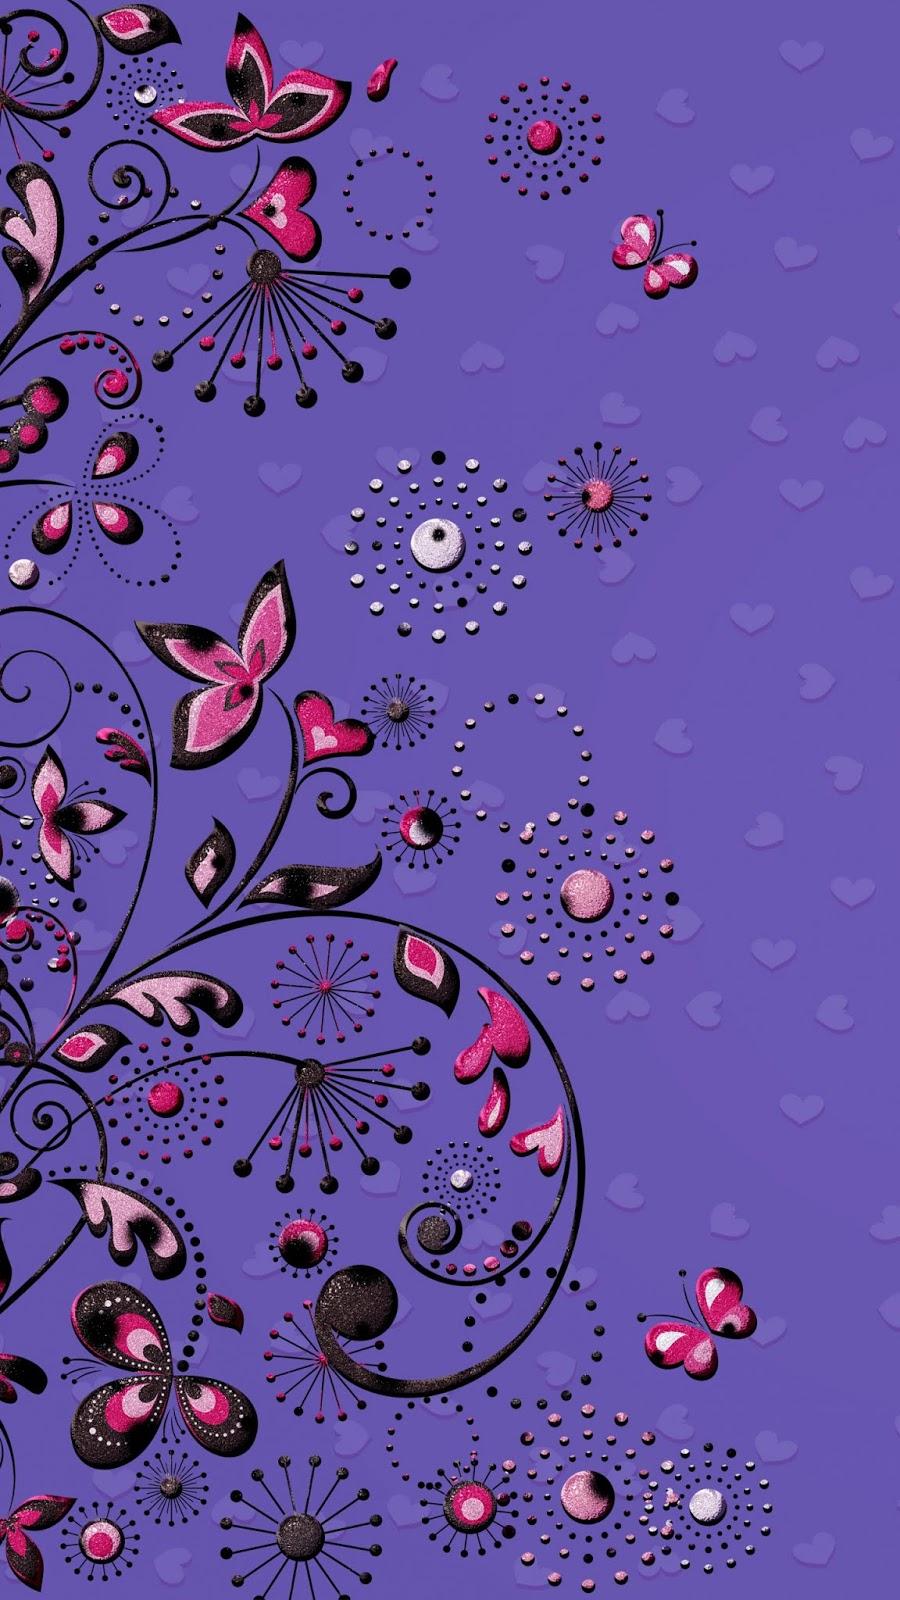 flower violet plant pattern purple